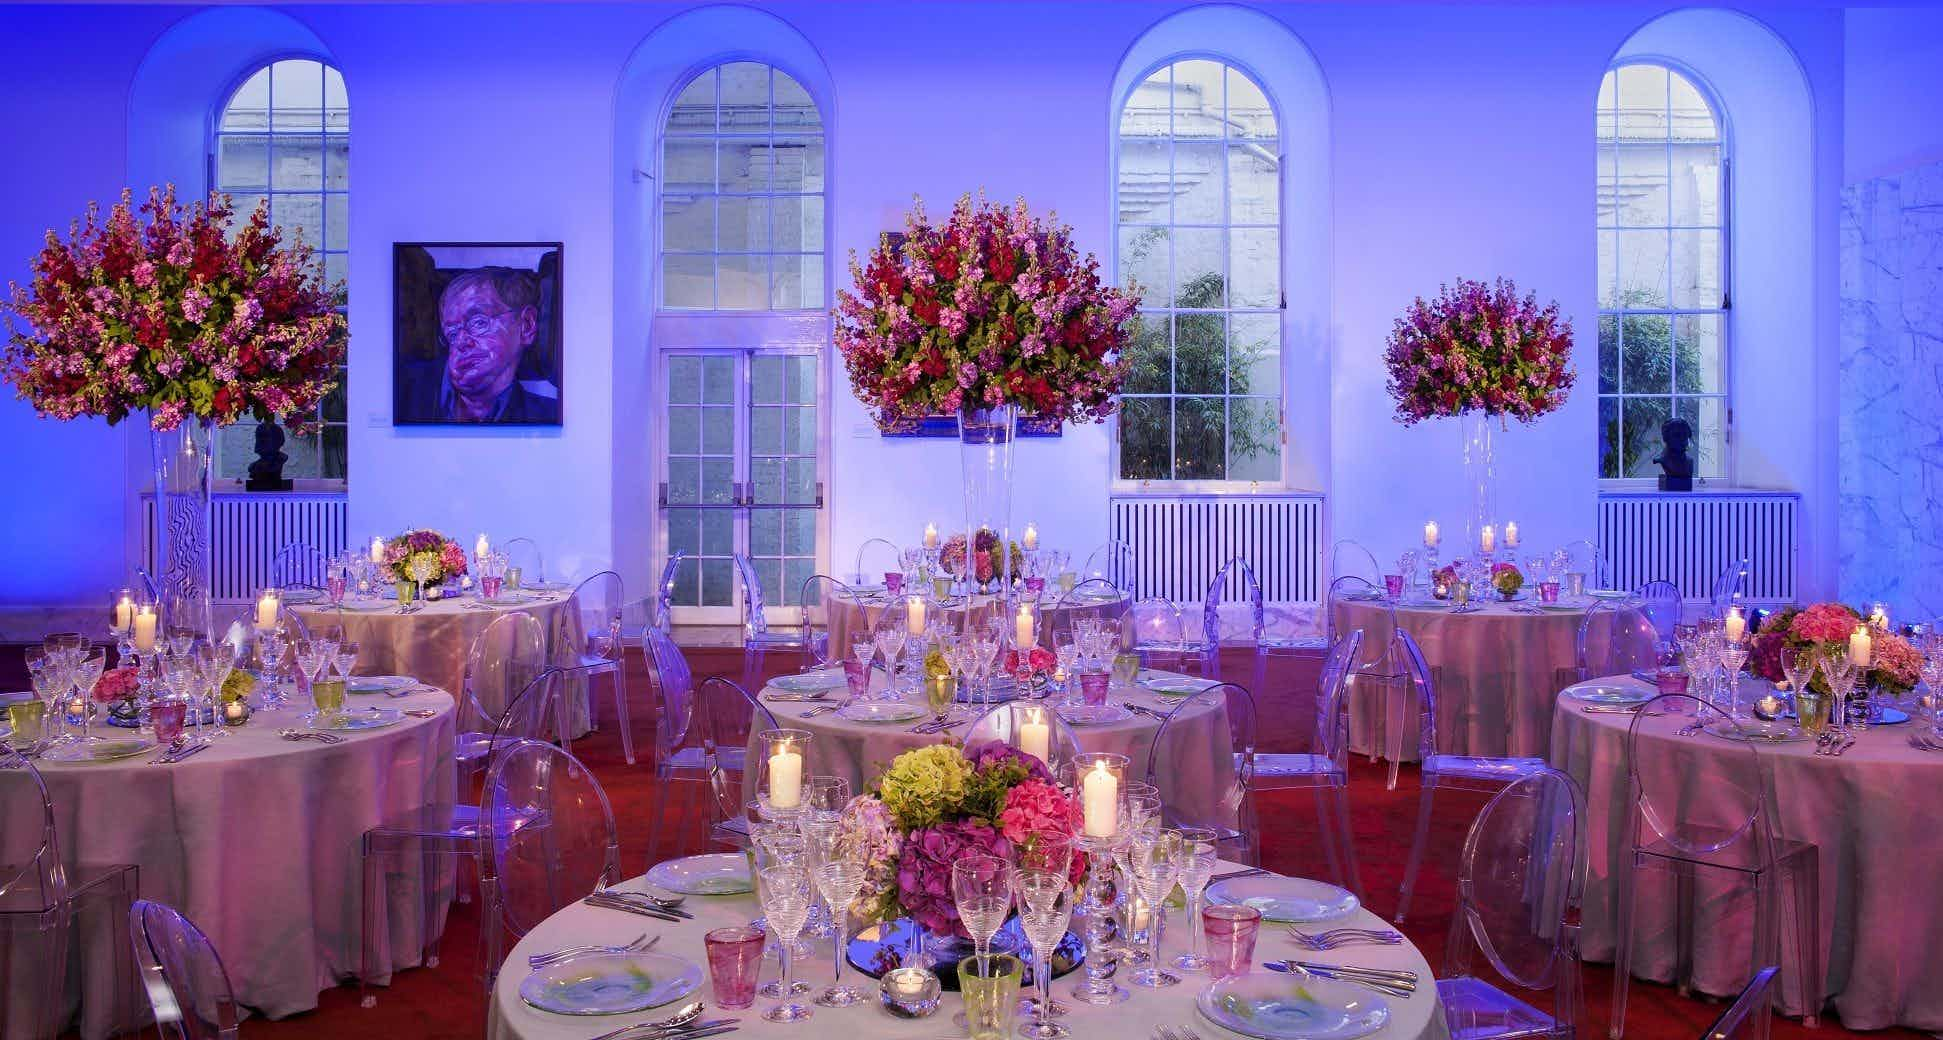 Dining Room., The Royal Society